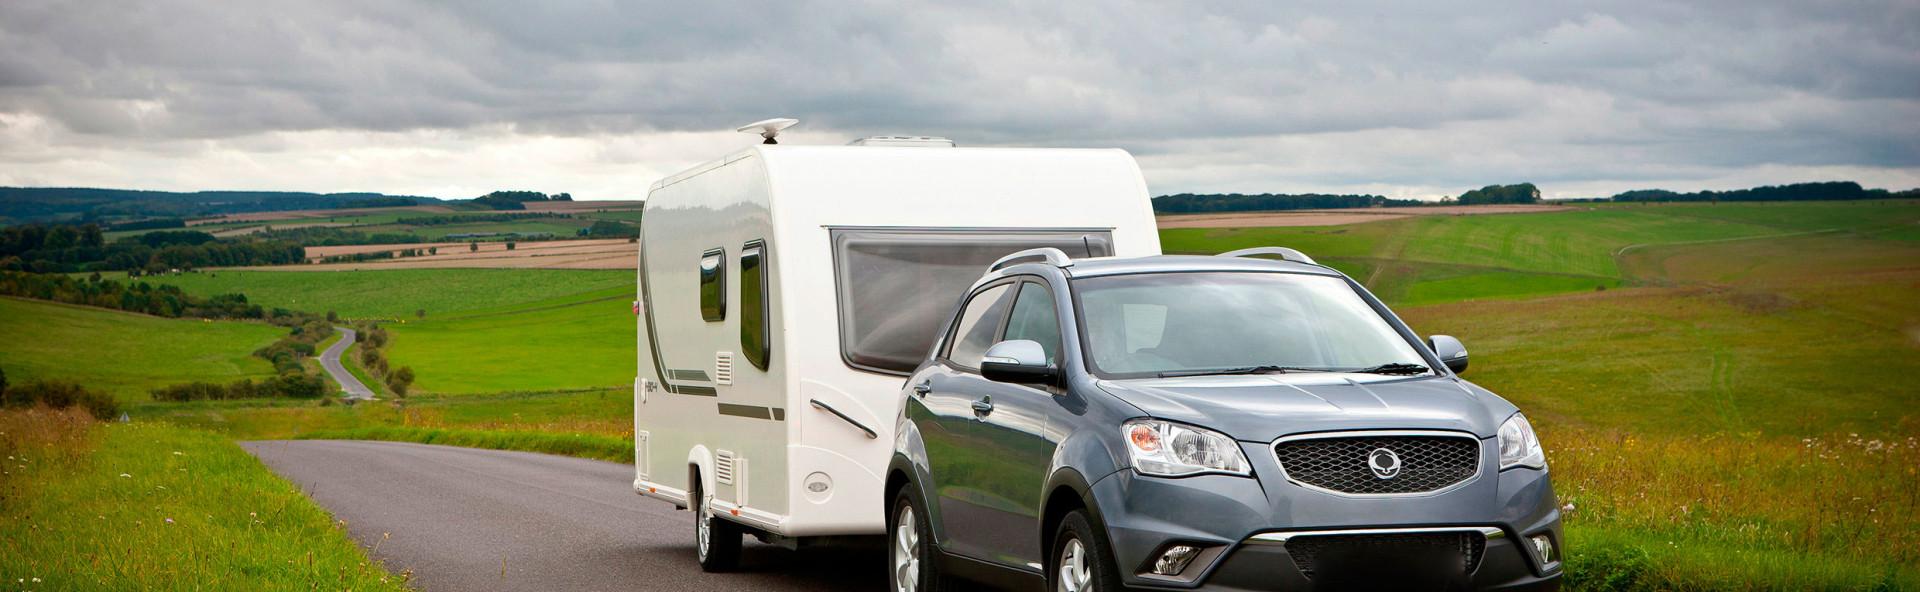 coche_caravana